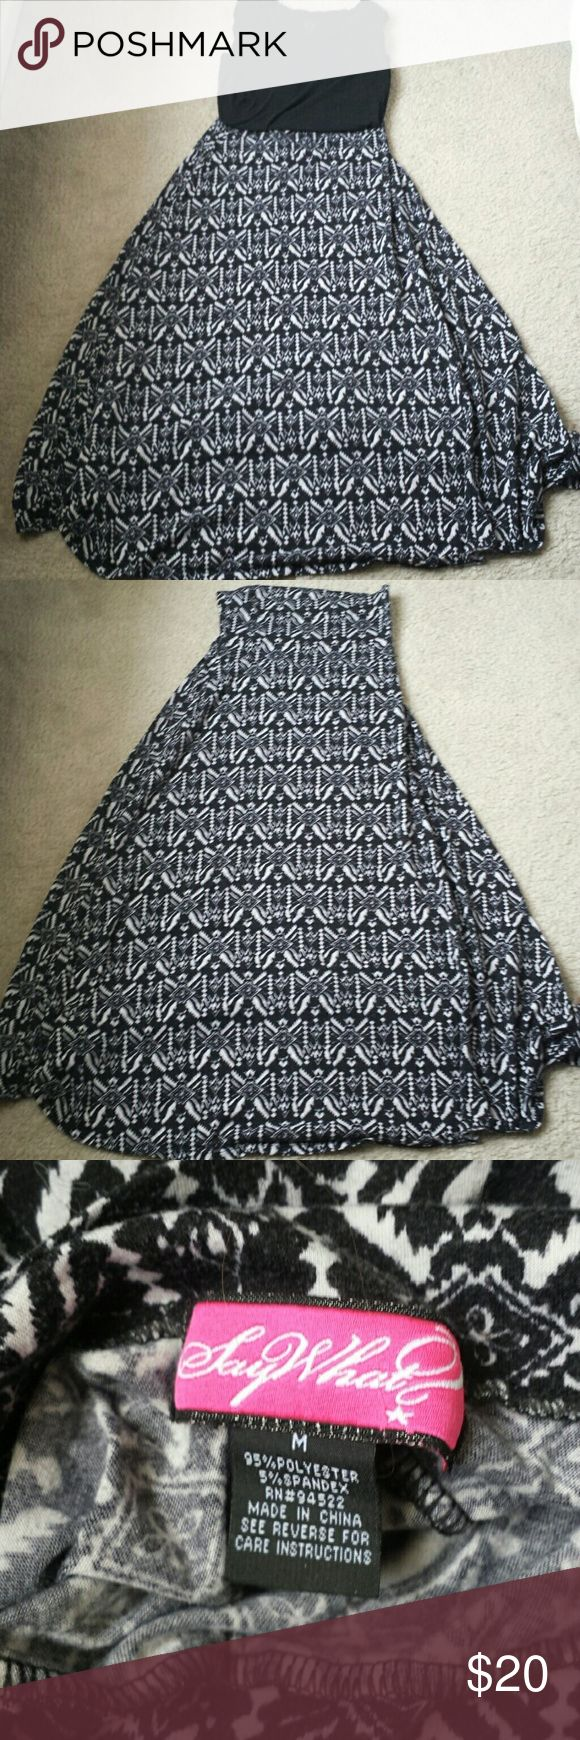 Black and white tribal print maxi skirt size M Black and white tribal print maxi skirt jr/ms size M Skirts Maxi